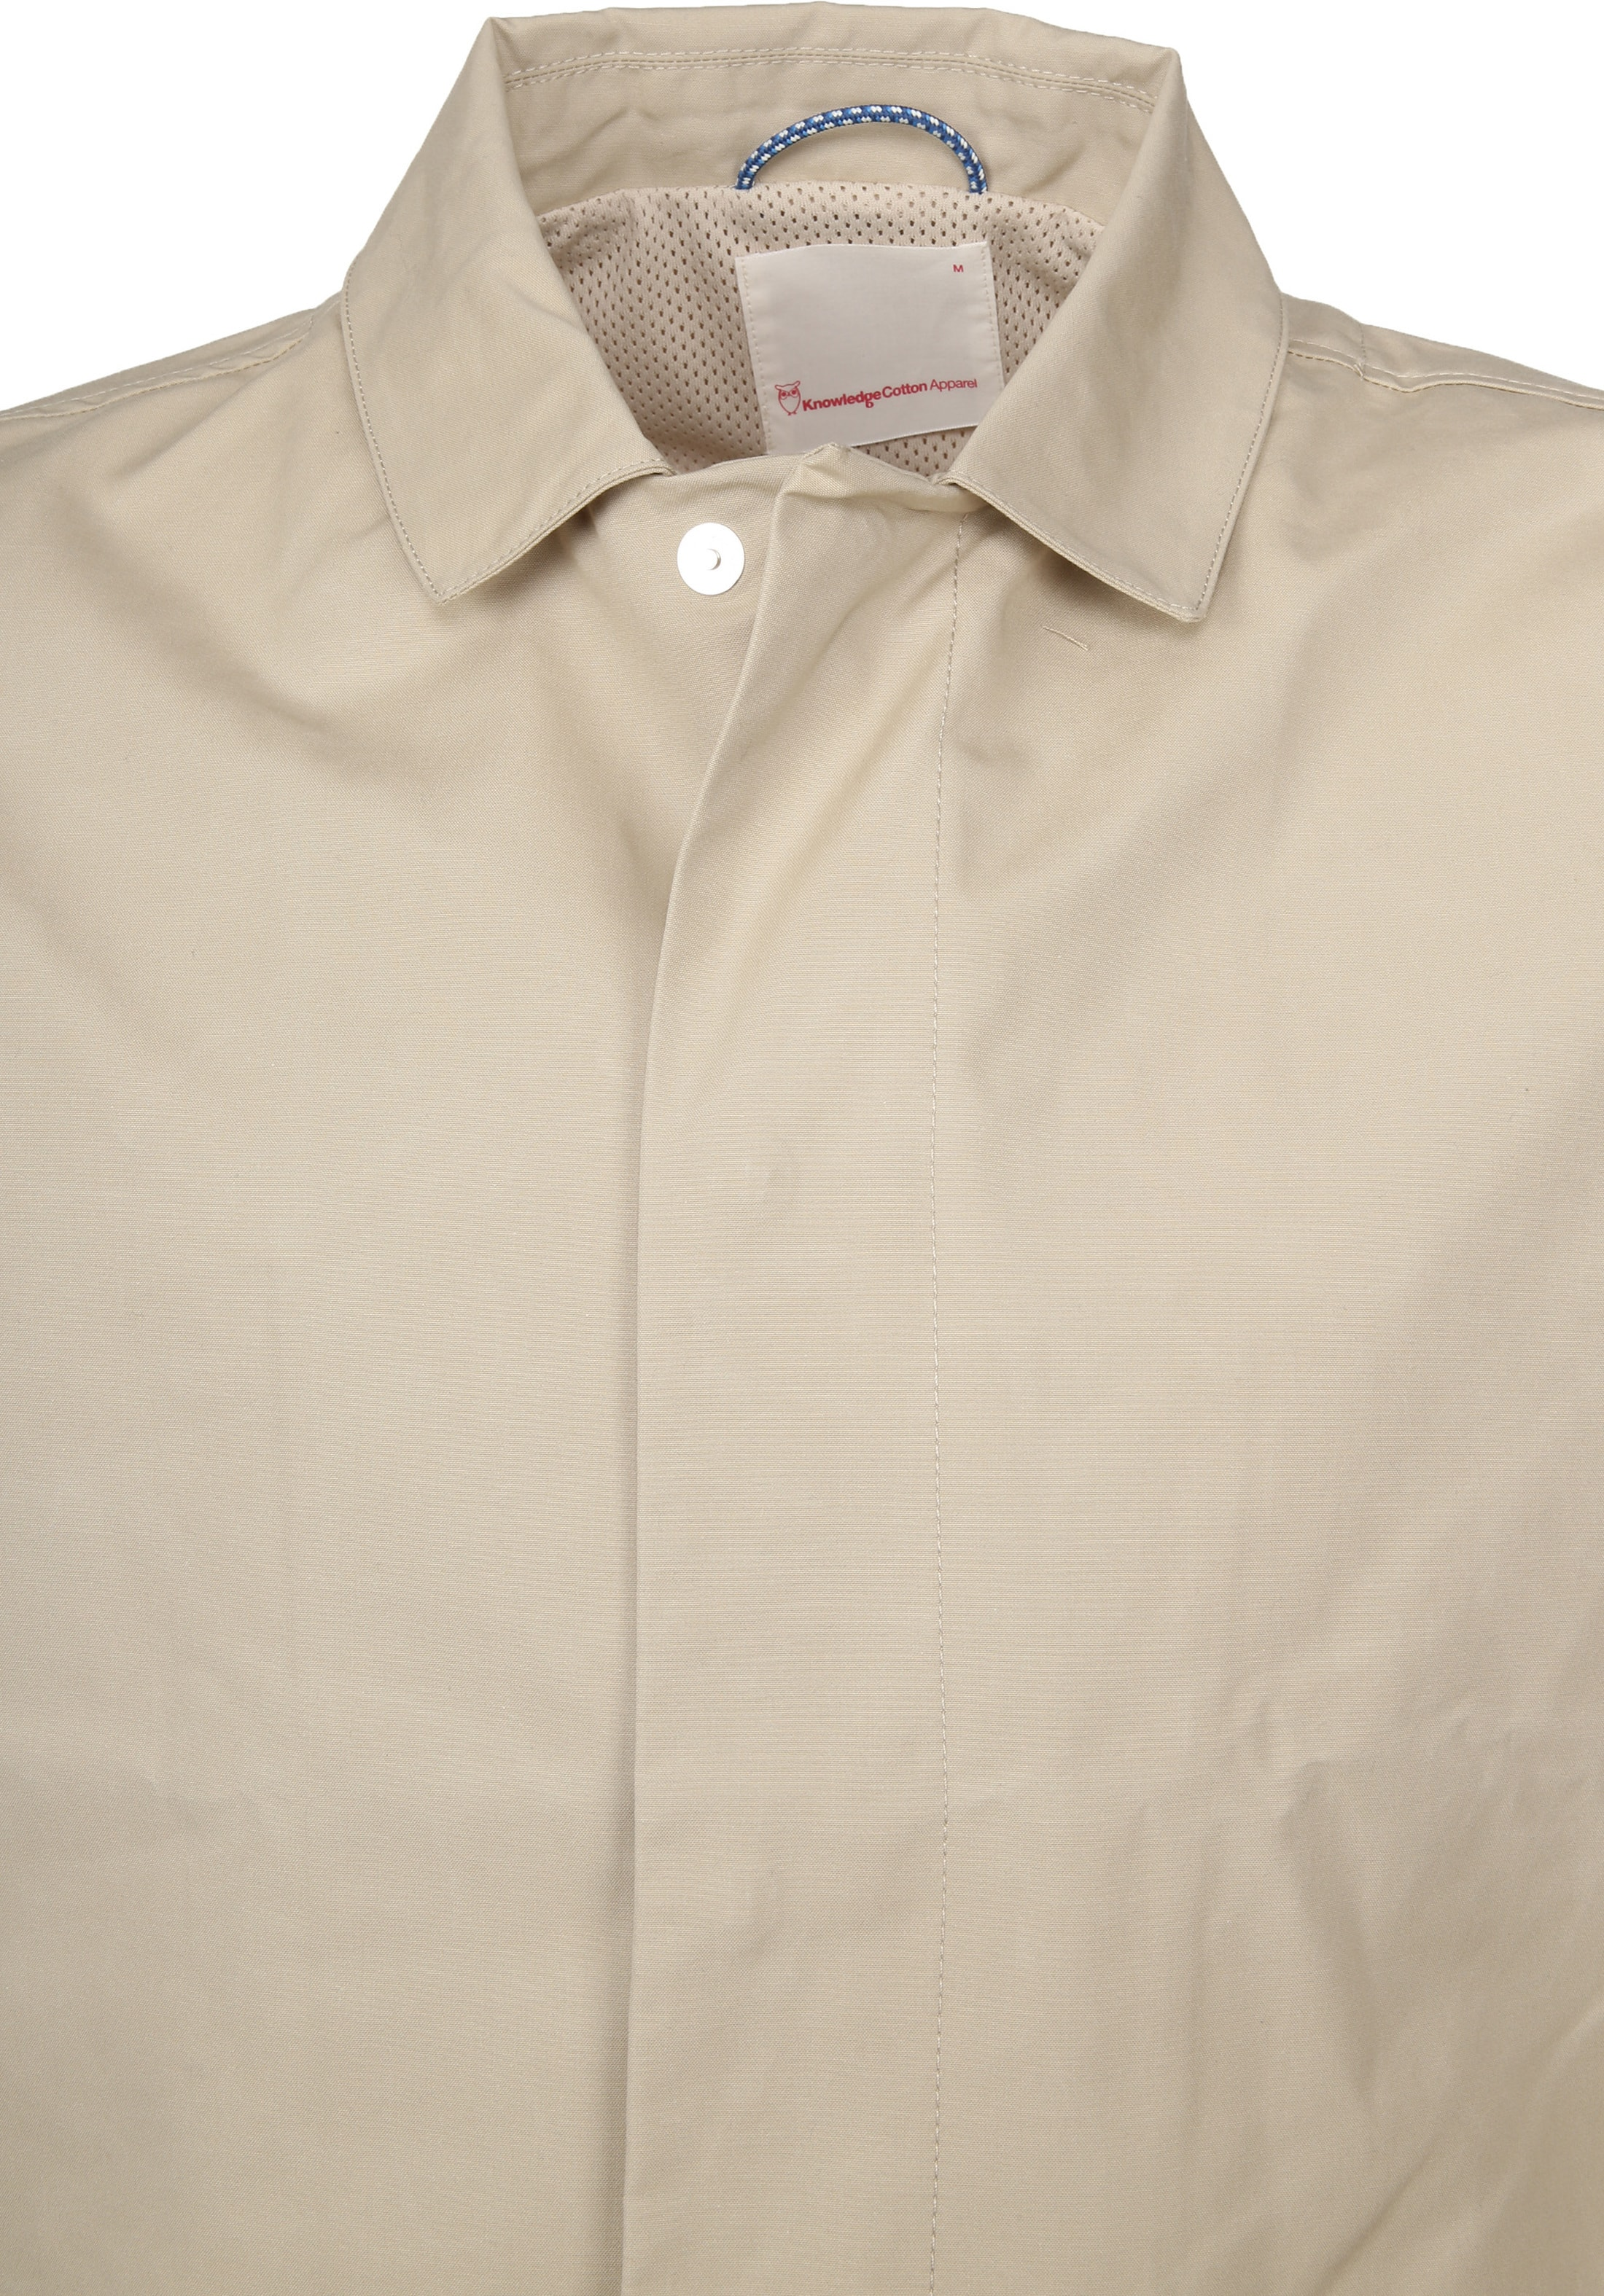 Knowledge Cotton Apparel Carcoat Beige foto 1